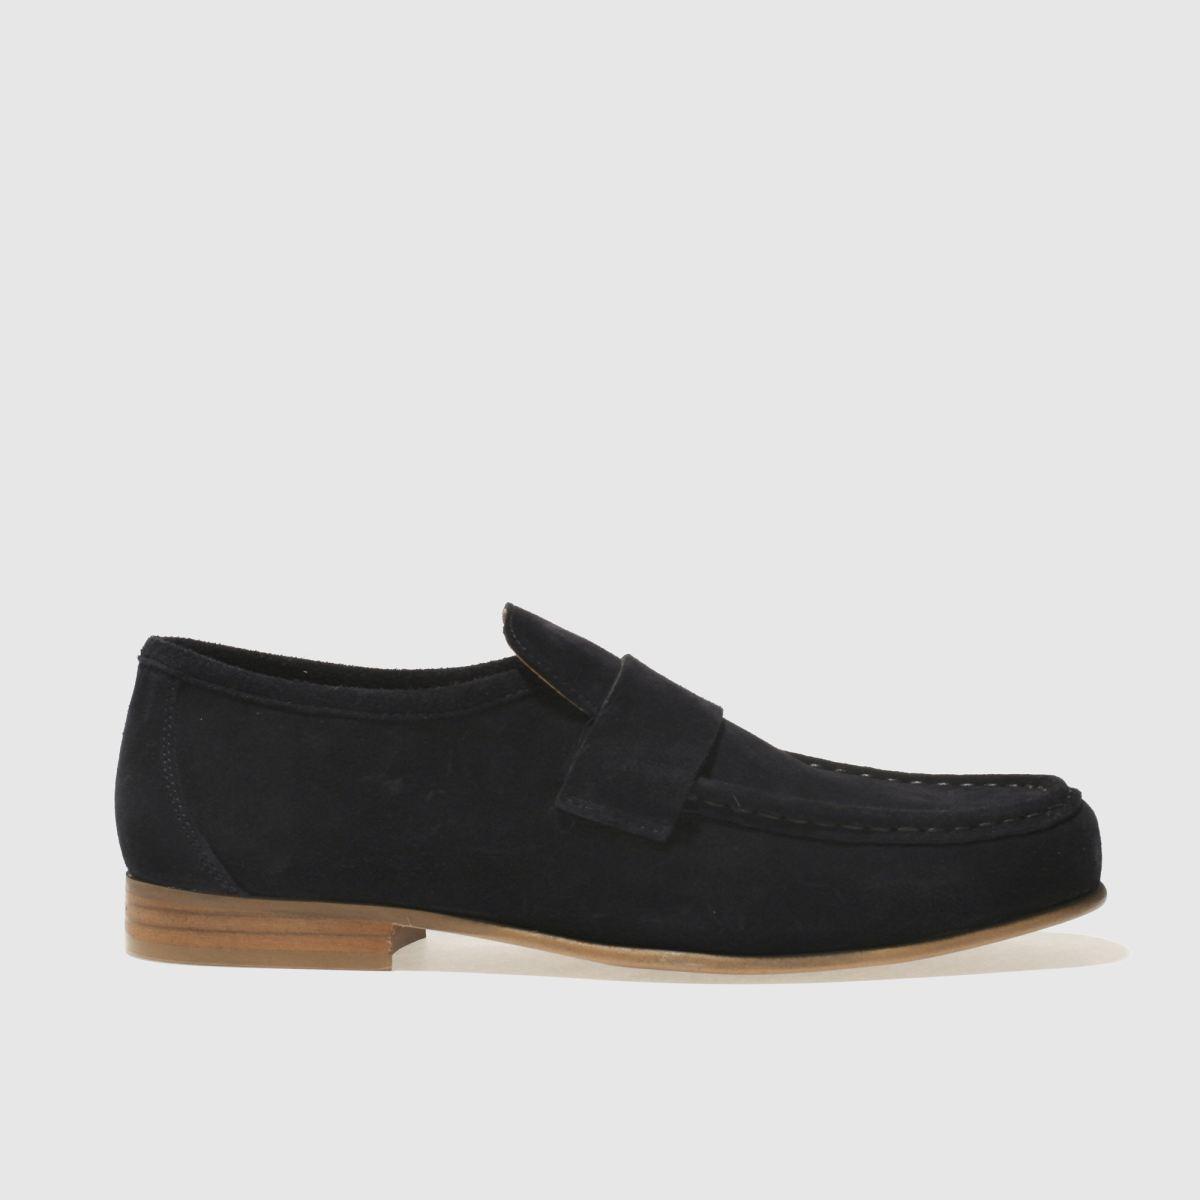 Schuh Navy Argent Shoes